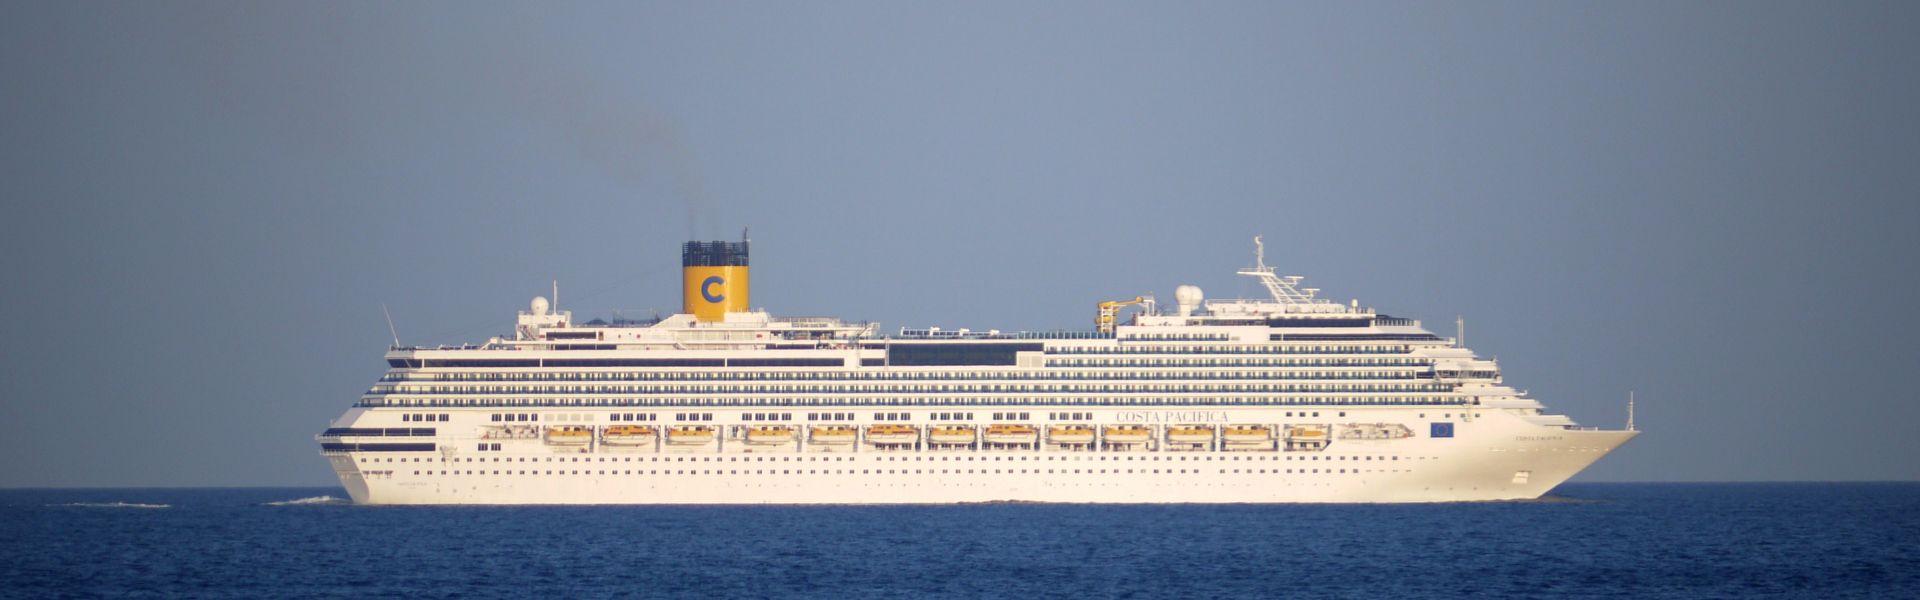 Croaziera 2017 - Europa de Vest (Kiel) - Costa Cruises - Pacifica - 12 nopti